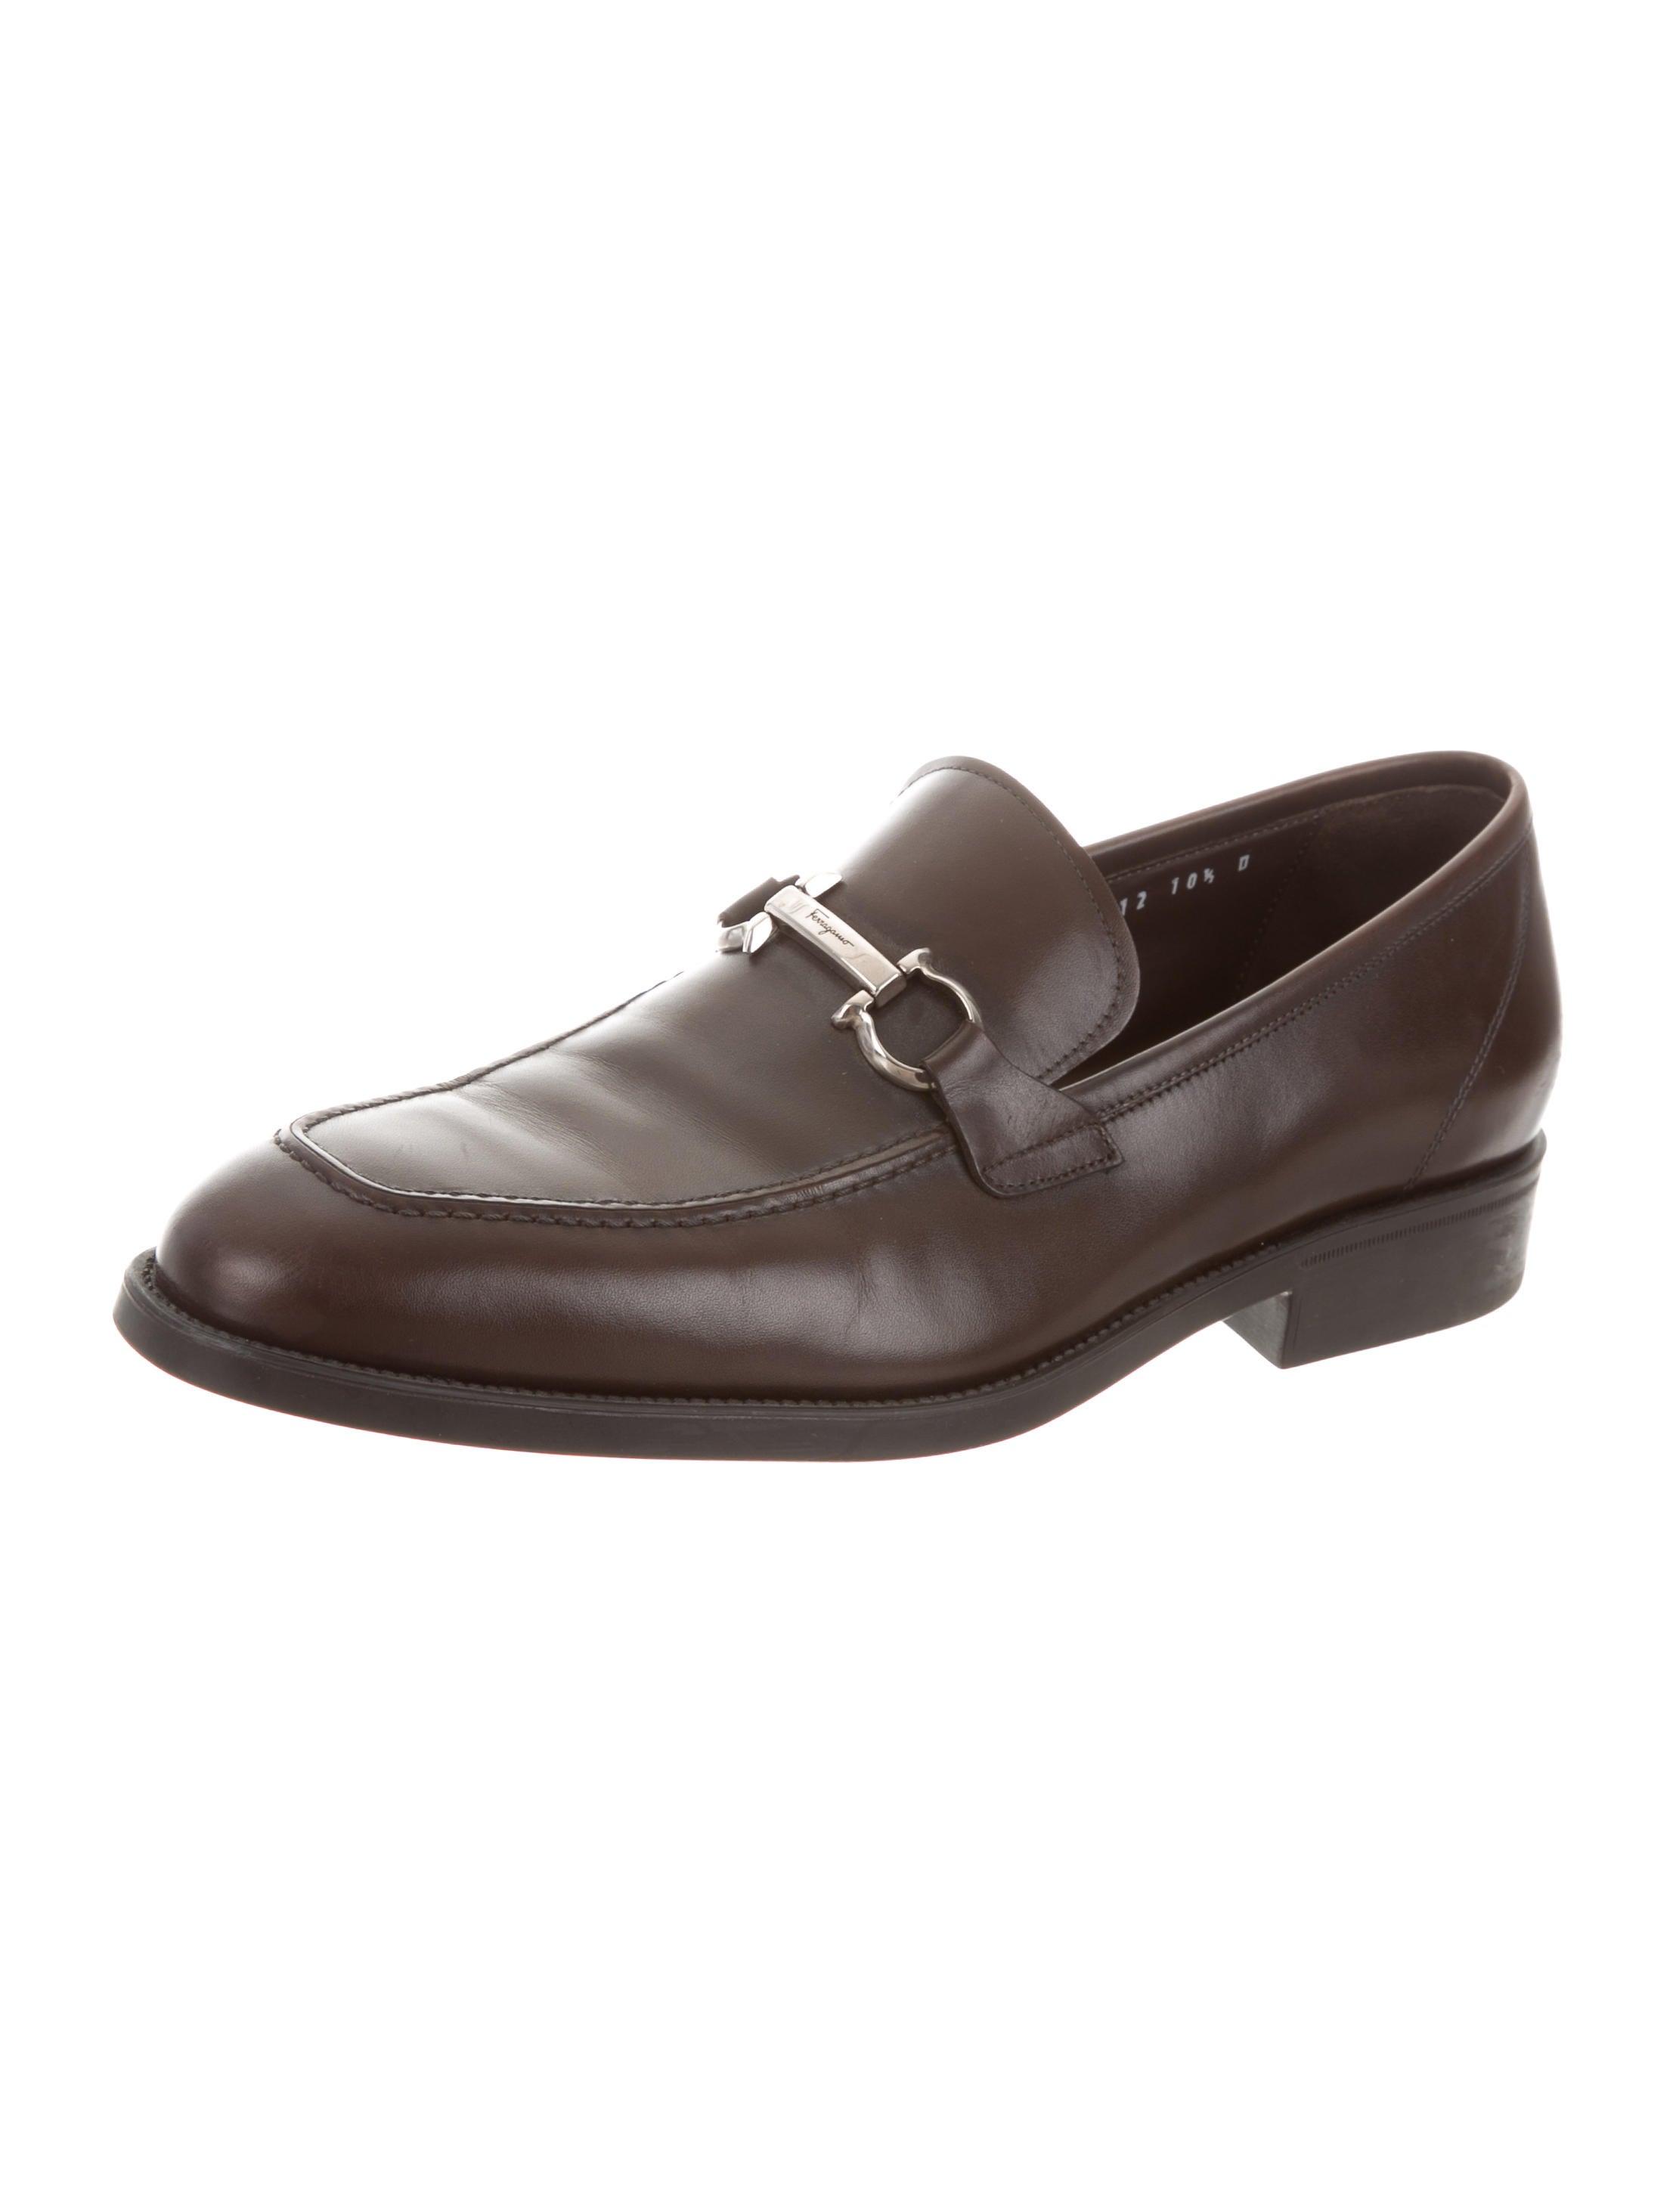 Salvatore FerragamoGancini Leather Loafers